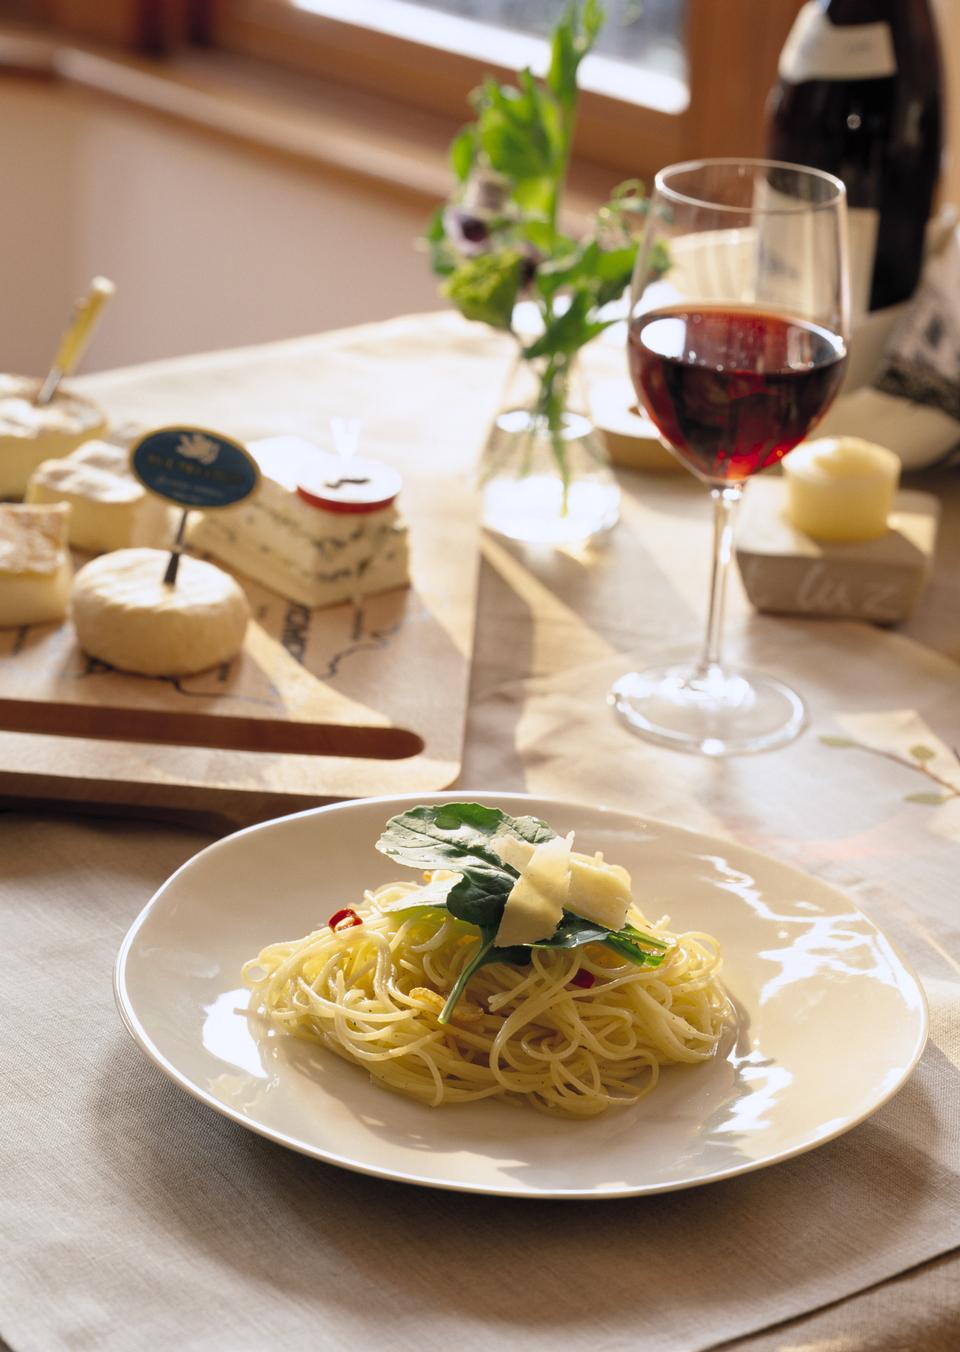 Spaghetti cheese, glass of red wine